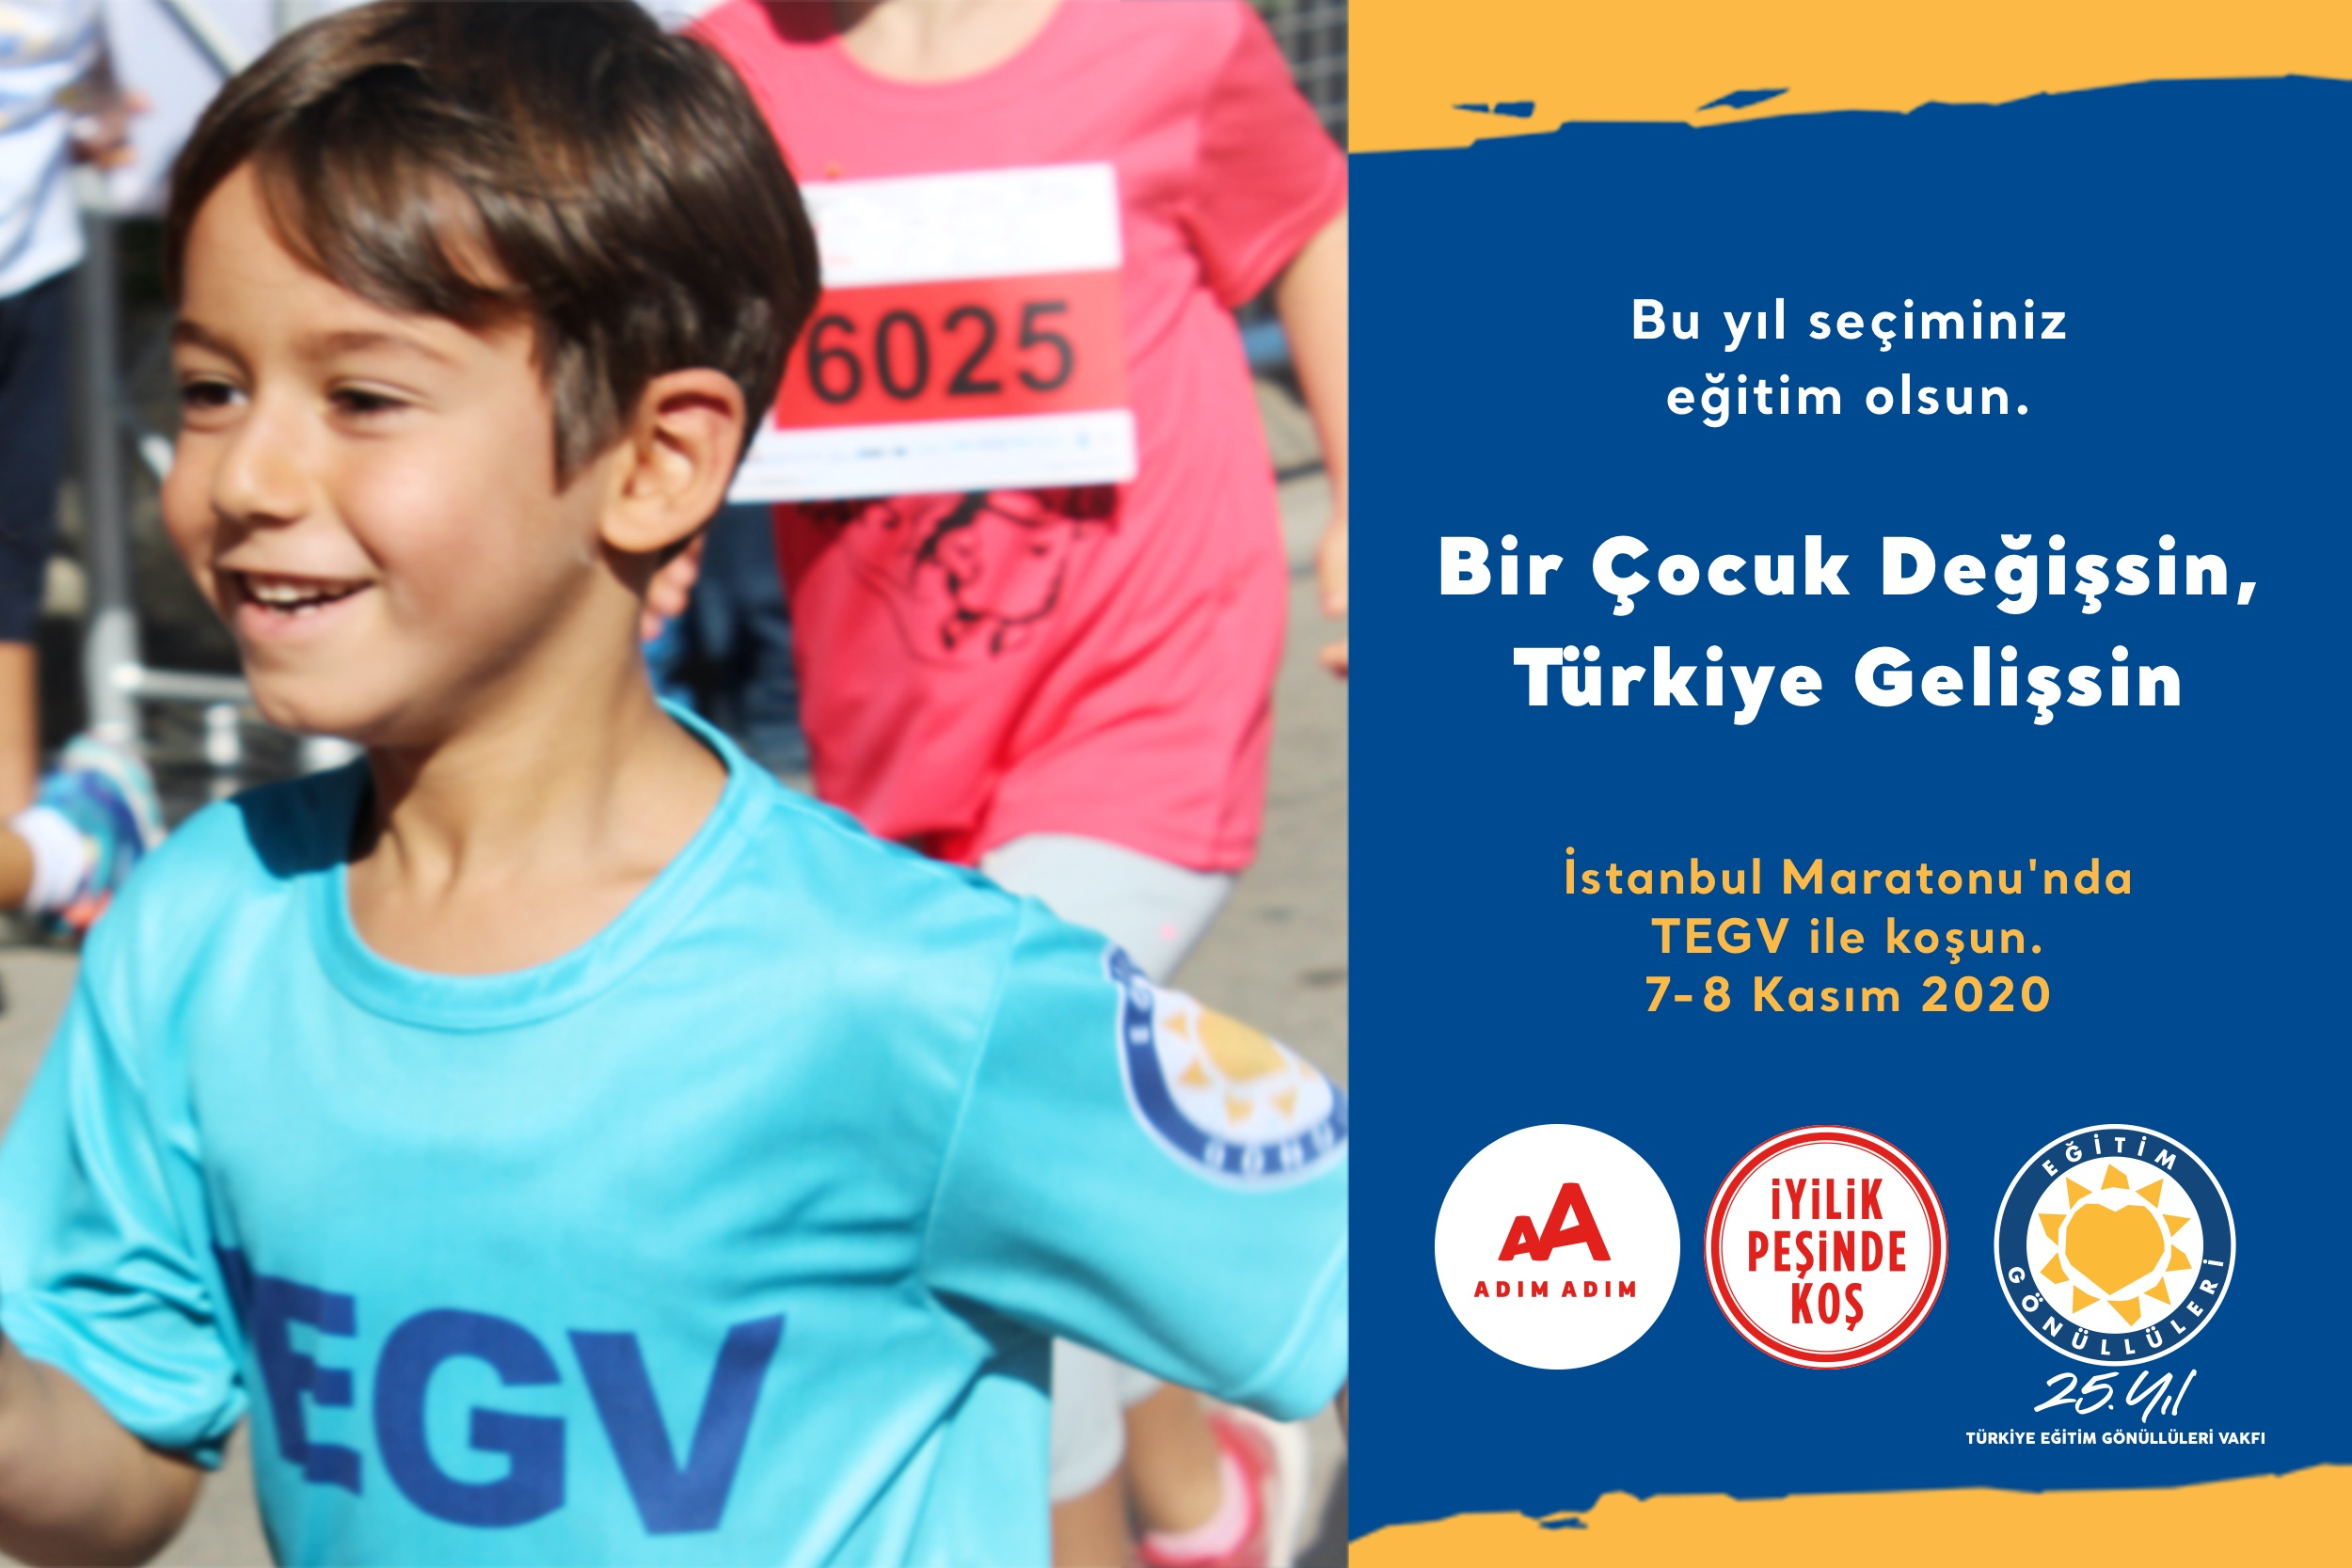 TEGV_Maraton2020